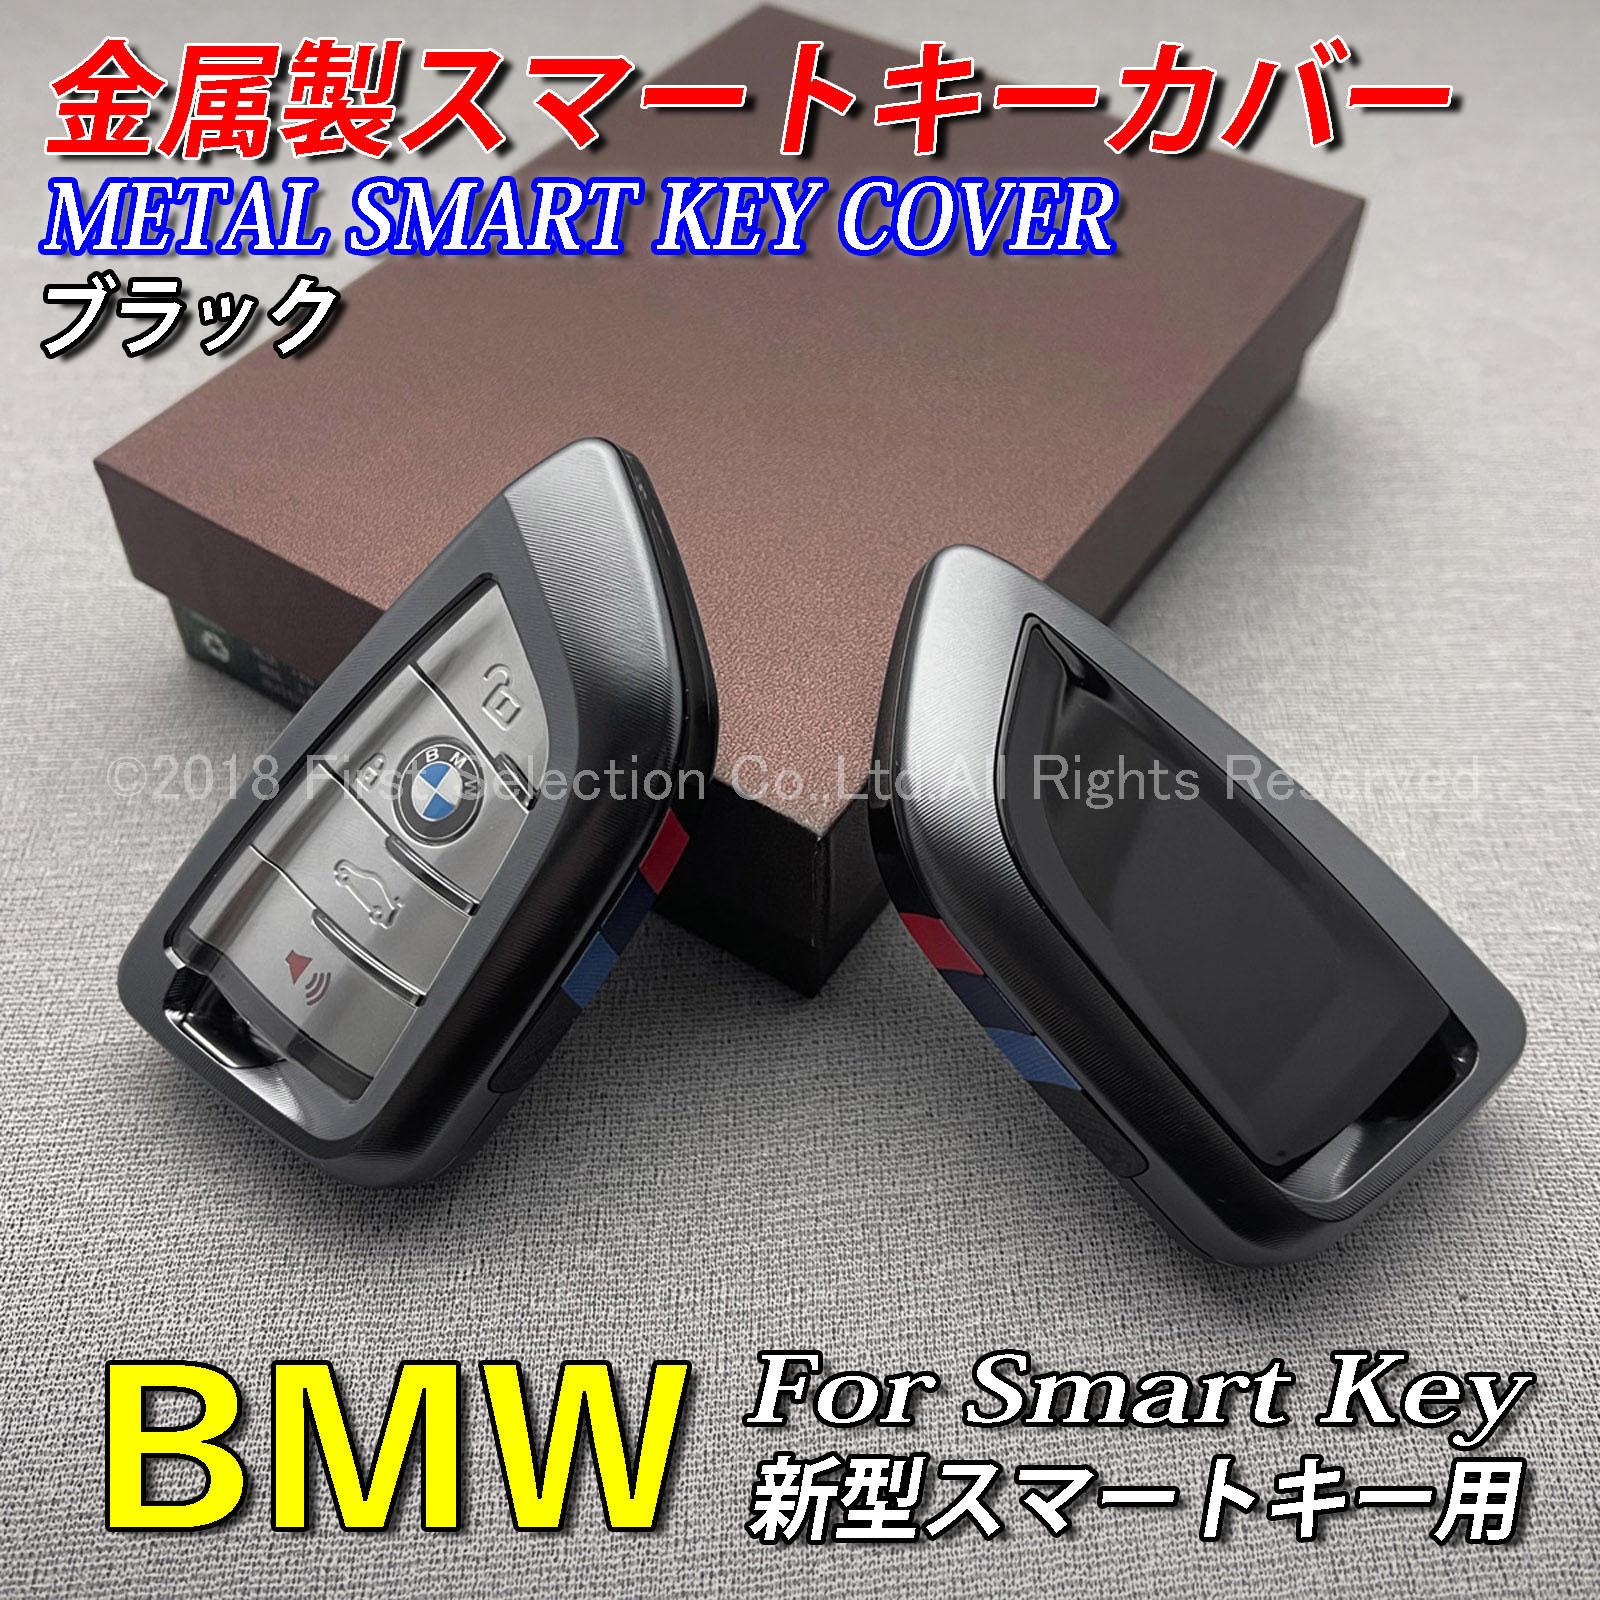 BMW 新型スマートキー用 軽量金属製スマートキーカバー黒 F40 F45 F46 F44 G20 G30 G32 G14 G15 F48 F39 G01 G02 F15 G05 F16 G06 G07 G29